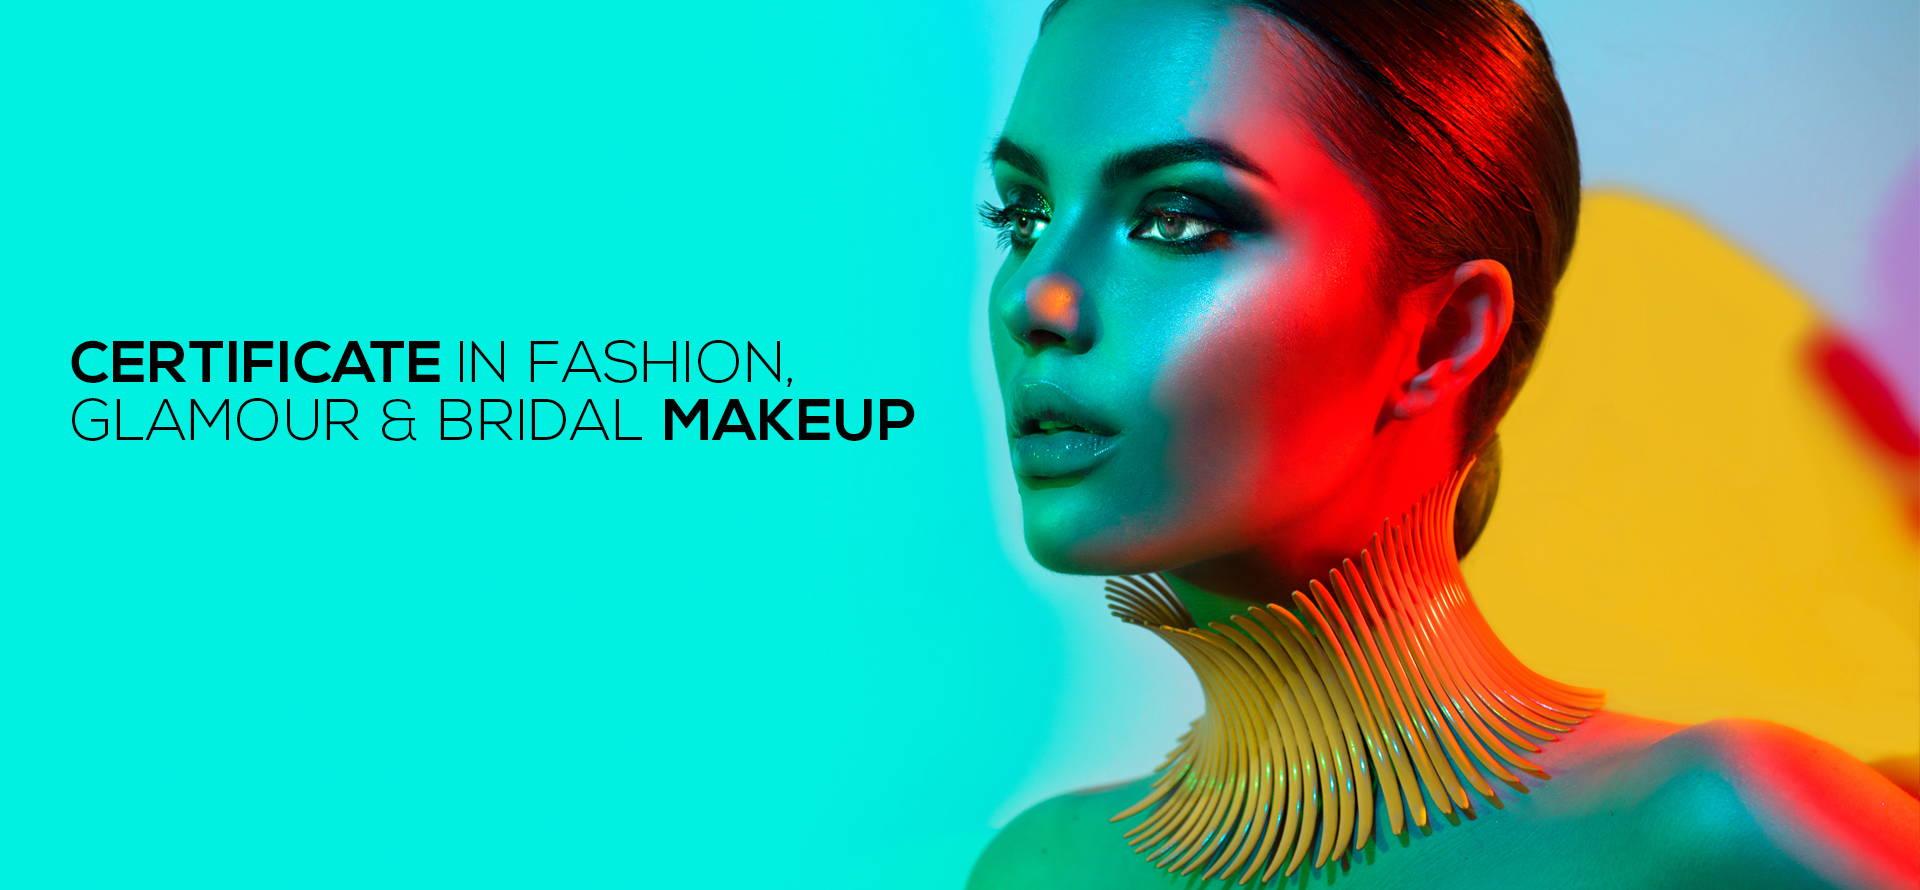 Fashion Glamour Bridal Makeup